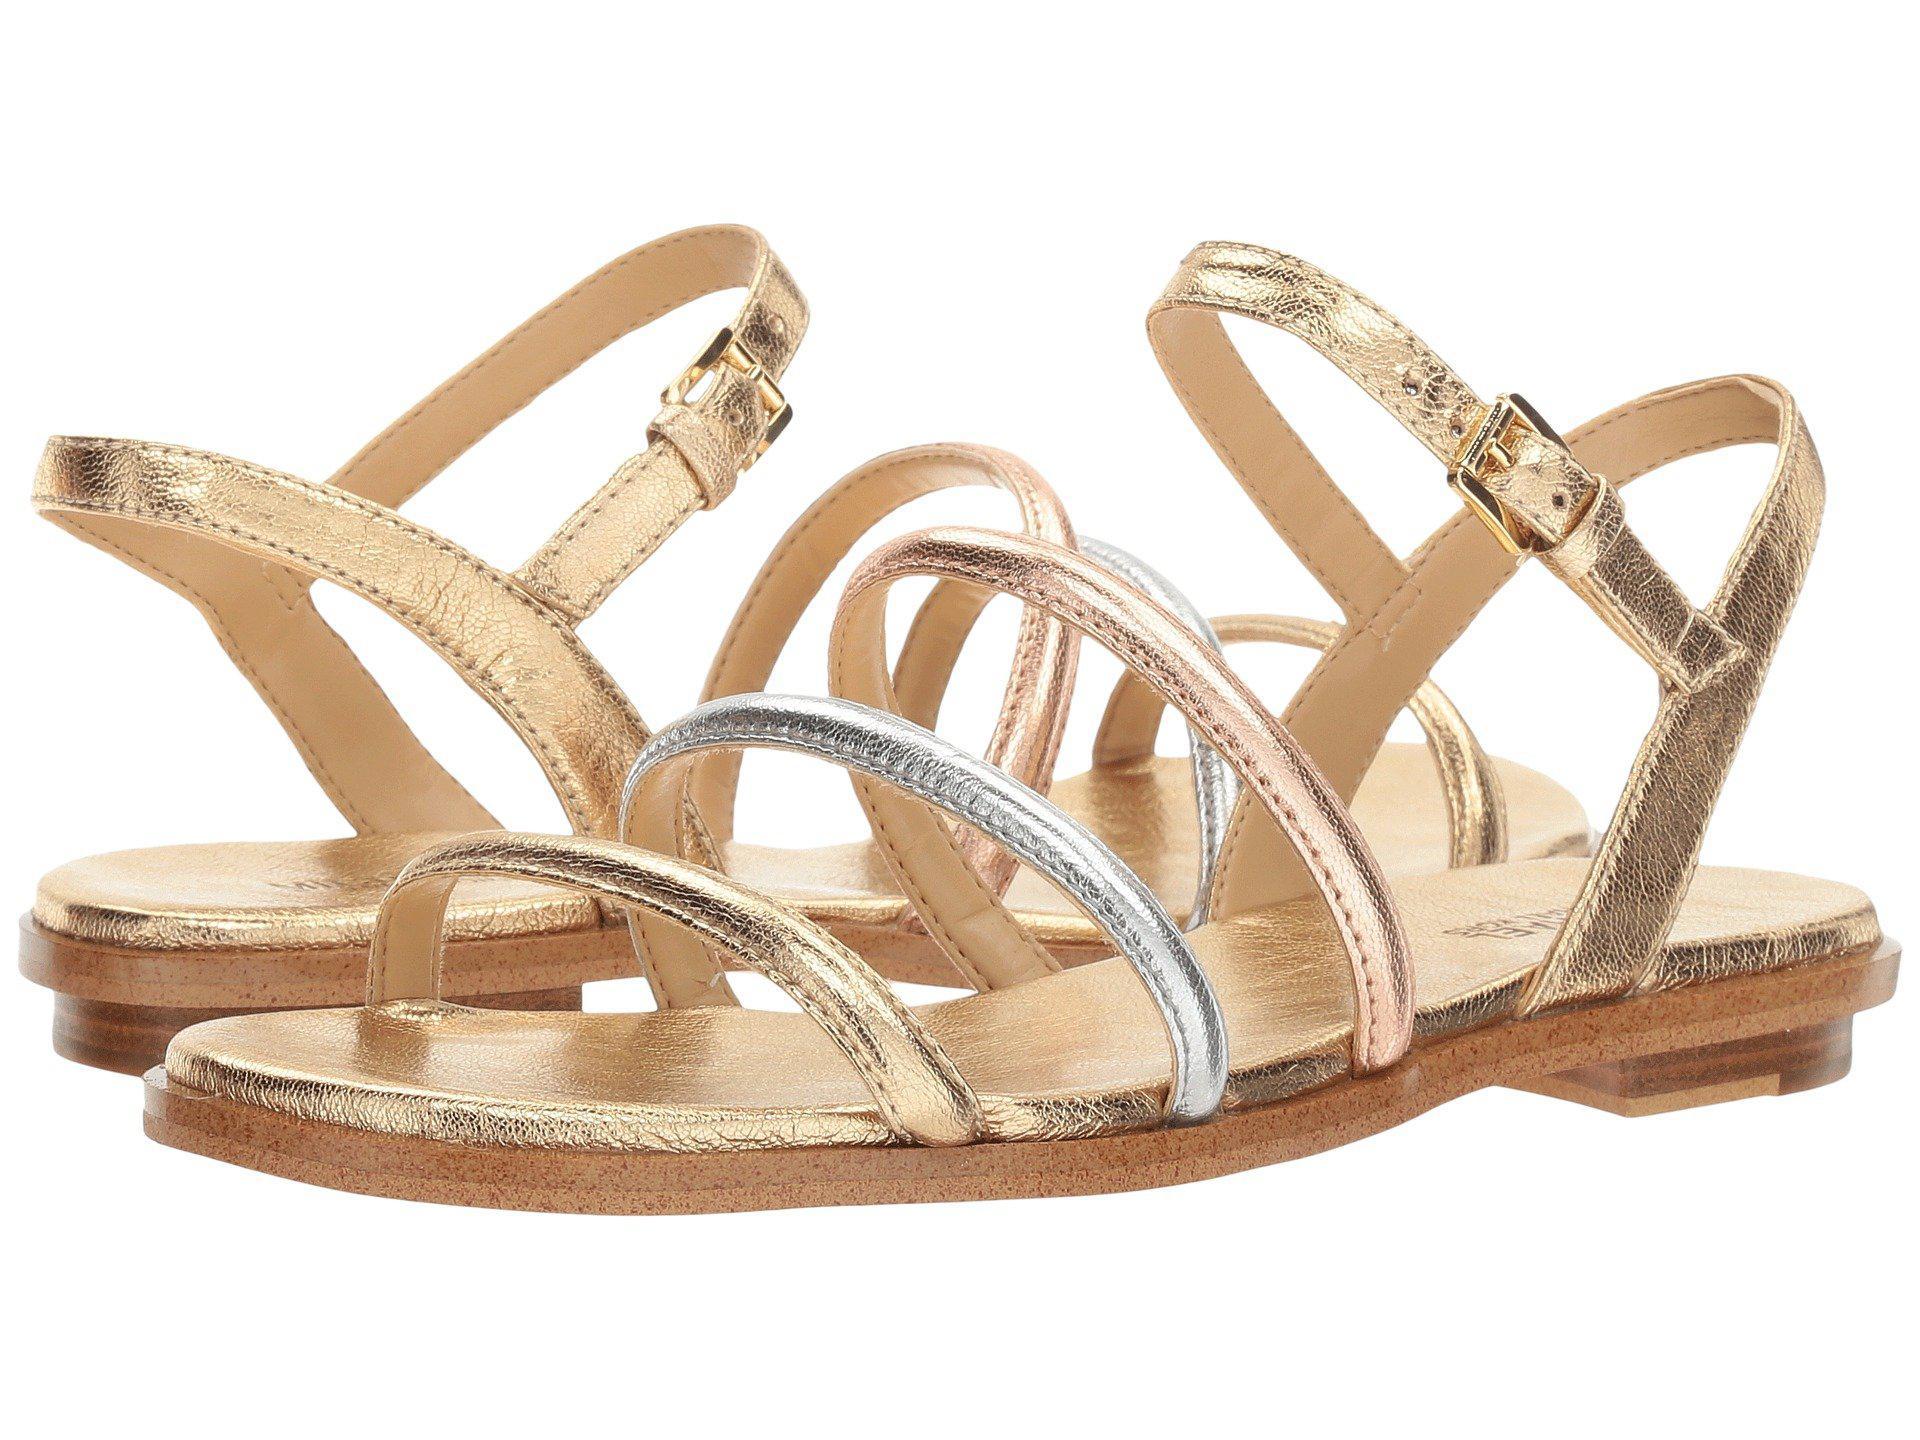 42c30ba26077 Lyst - MICHAEL Michael Kors Nantucket Flat Sandal in Metallic